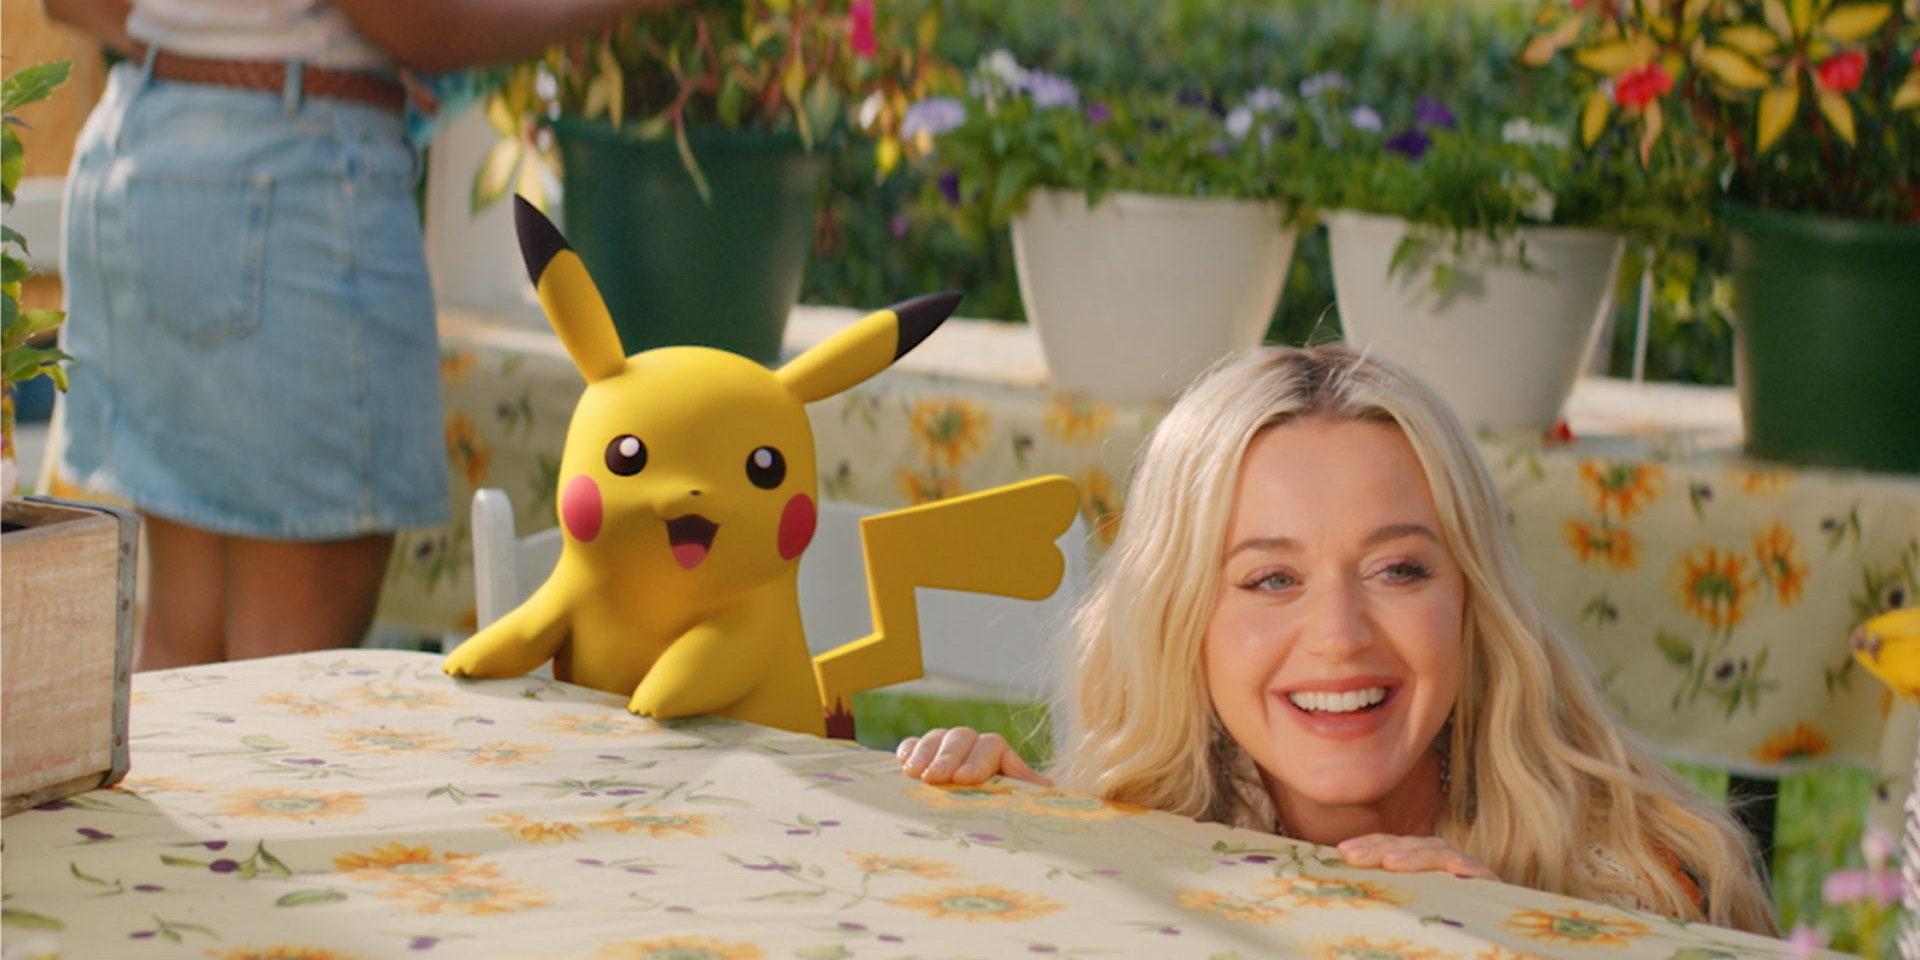 Katy Perry ปล่อย Music Video เพลงใหม่ 'Electric' ที่มีพิชูและพิคาชูจาก Pokémon ร่วมแสดงนำ